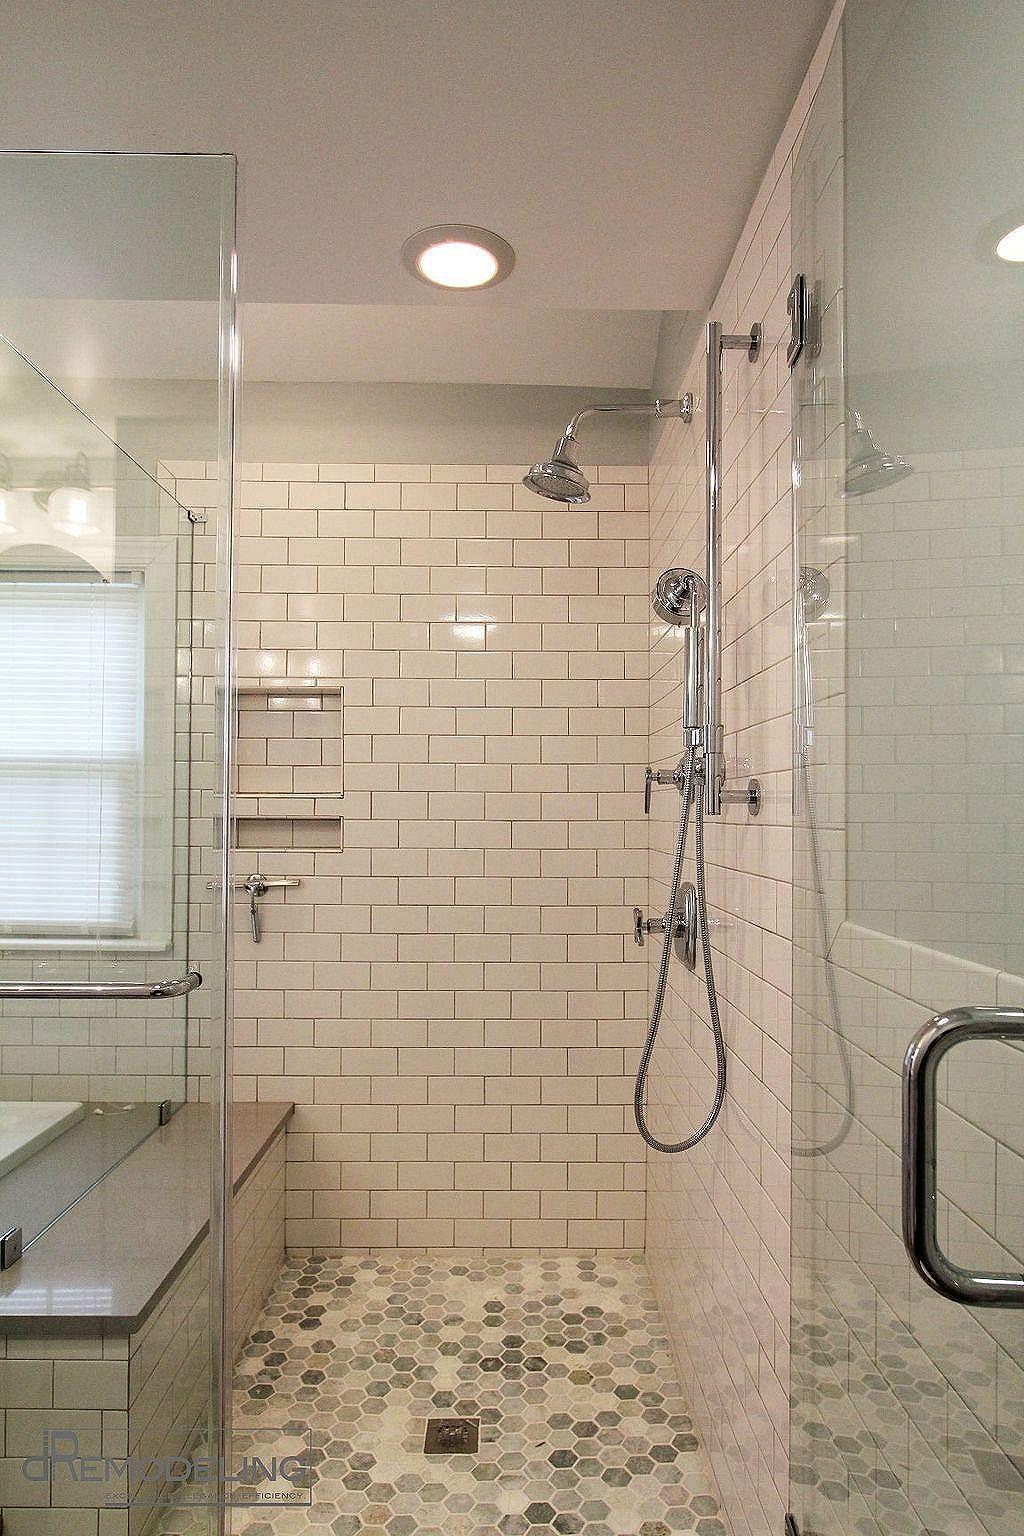 Elegant And Modern Bathroom Shower Tile Master Bath Ideas 29 Tile Walk In Shower White Subway Tile Shower Bathroom Remodel Shower